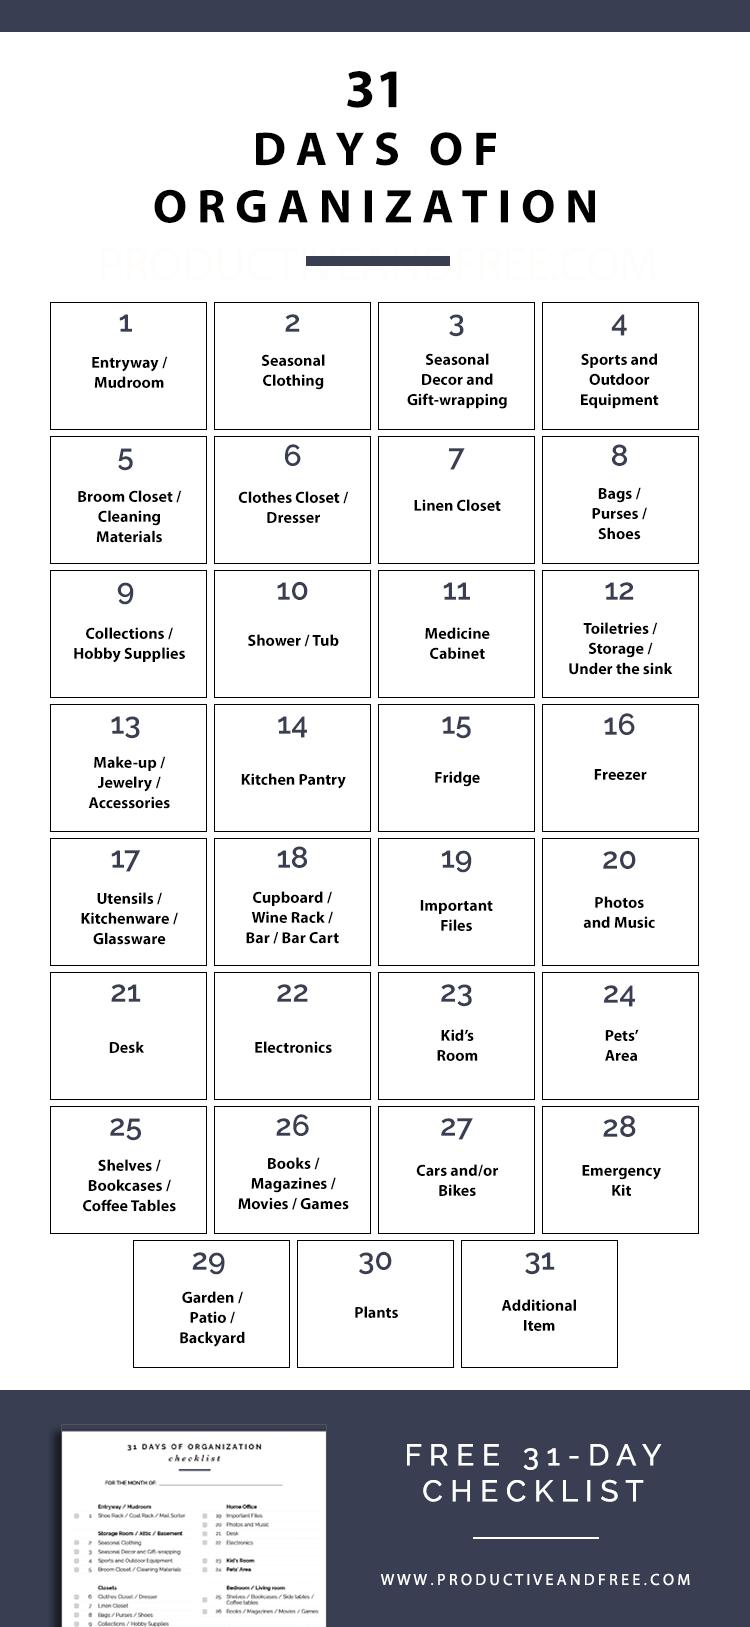 31 Days of Organization + Free Checklist | ProductiveandFree.com